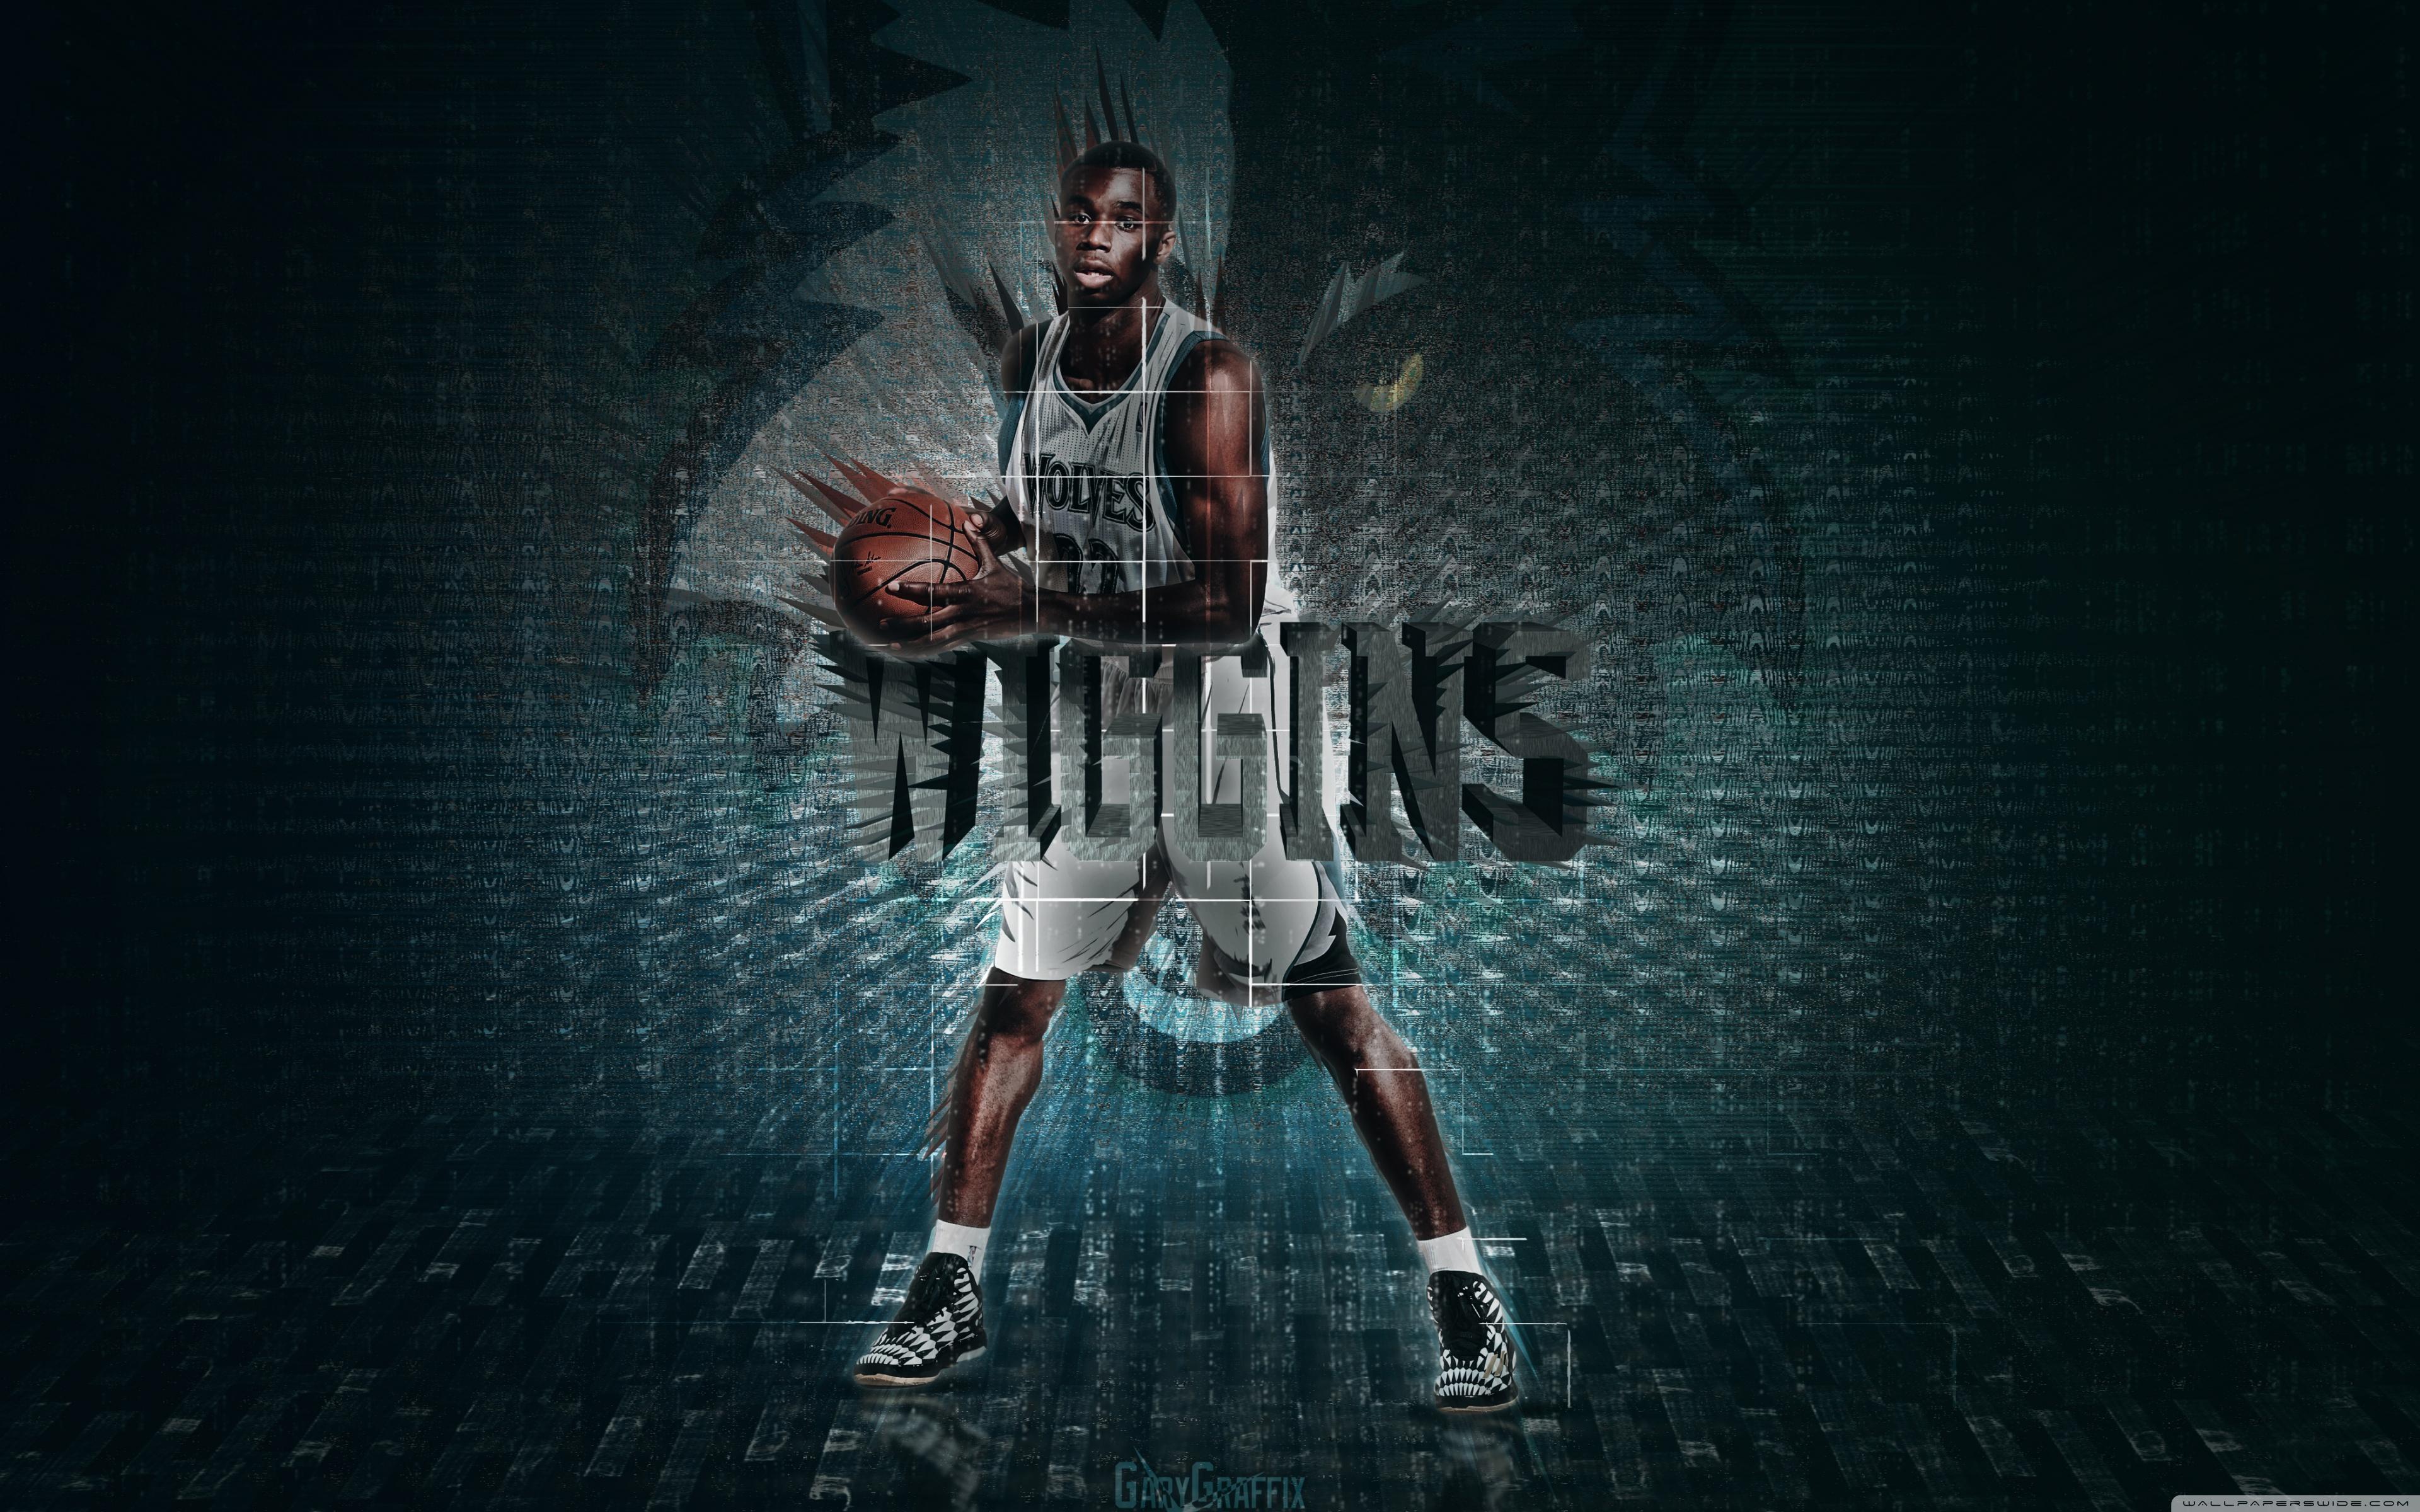 Andrew Wiggins Timberwolves Ultra HD Desktop Background Wallpaper 3840x2400